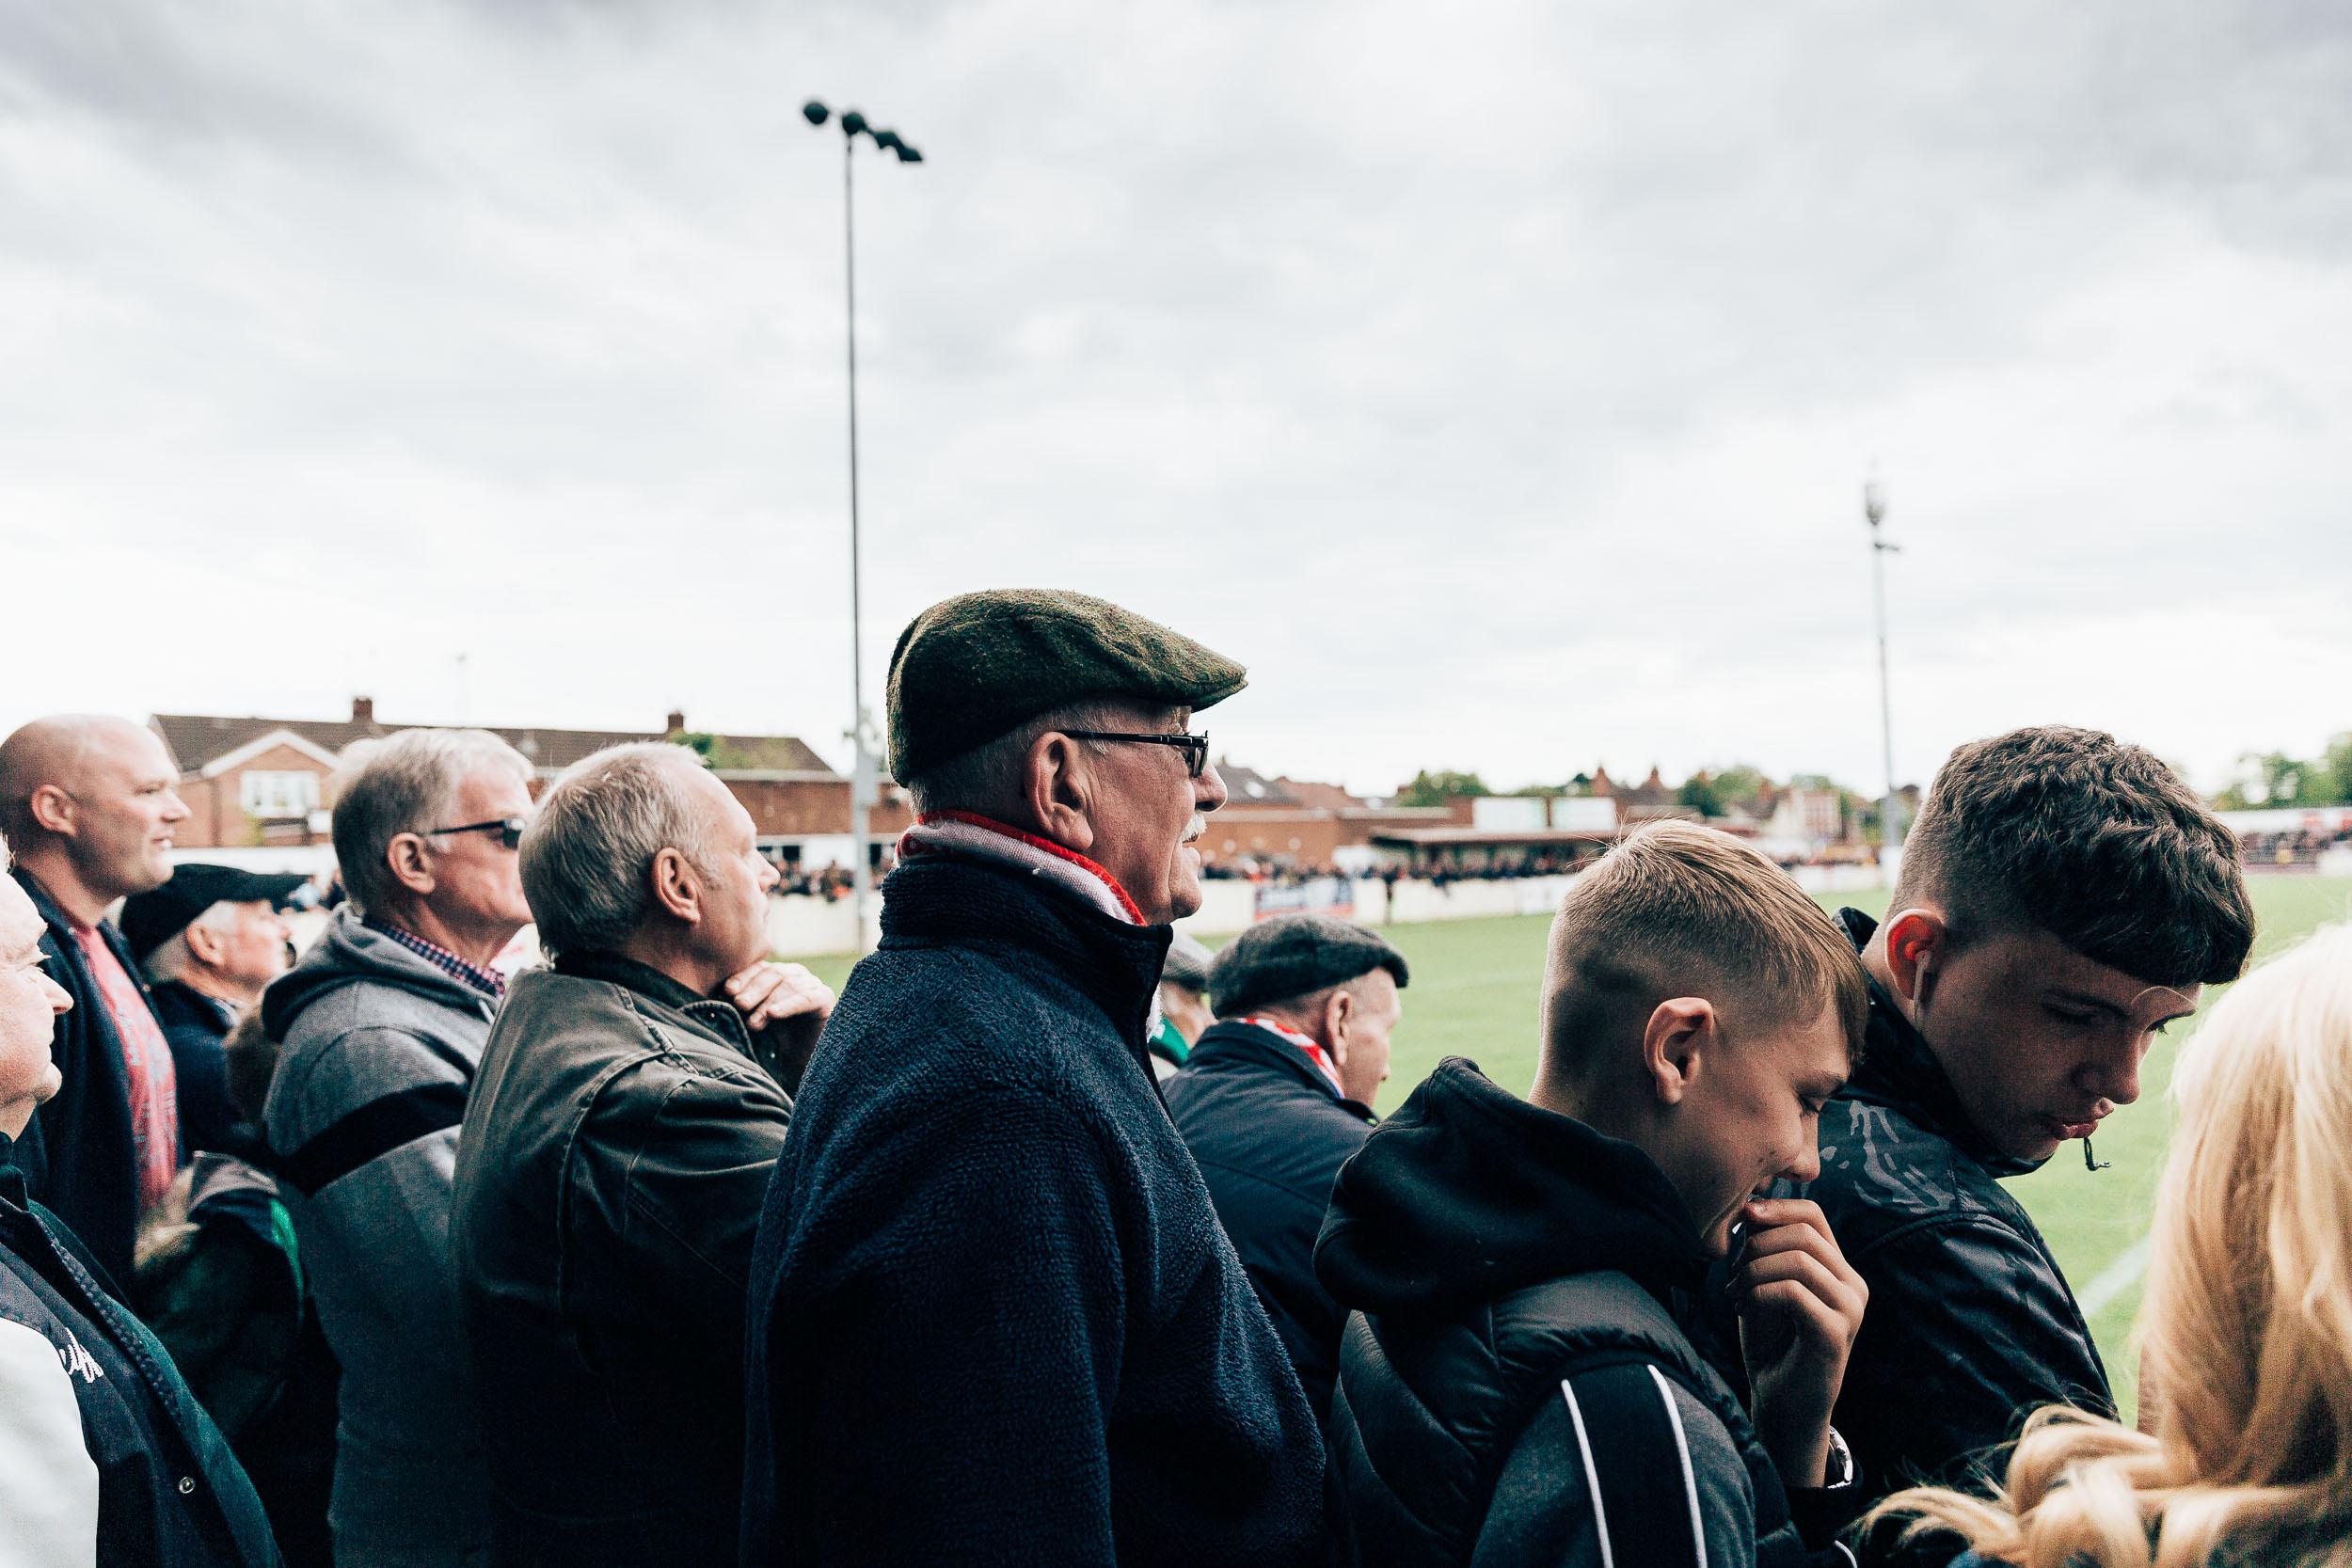 06_05_2019_Bromsgrove_Sporting_Corby-101.jpg